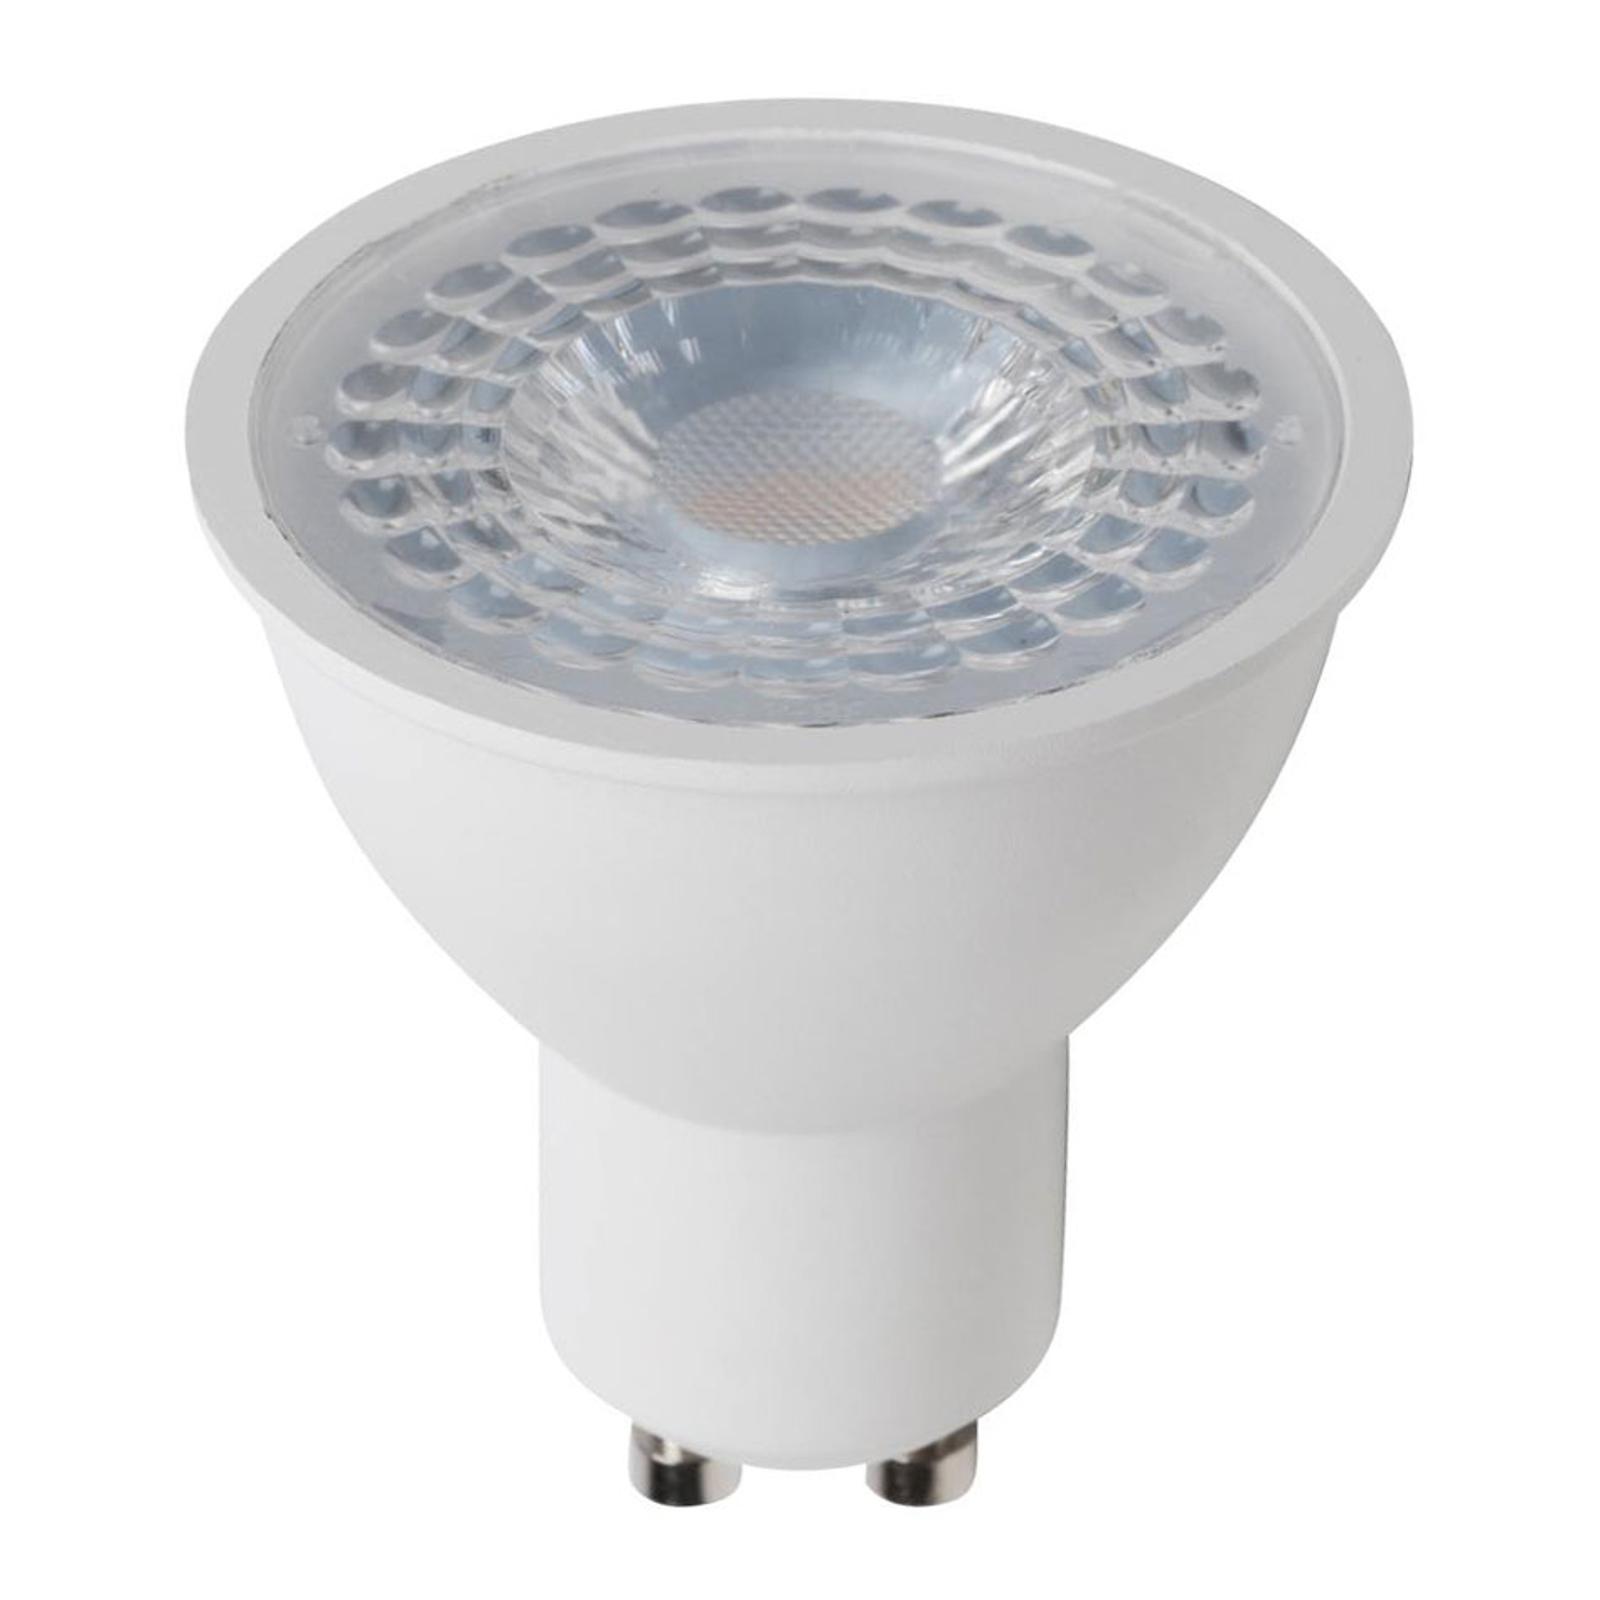 GU10 8W 828 LED reflektor MEGAMAN Smart Lighting